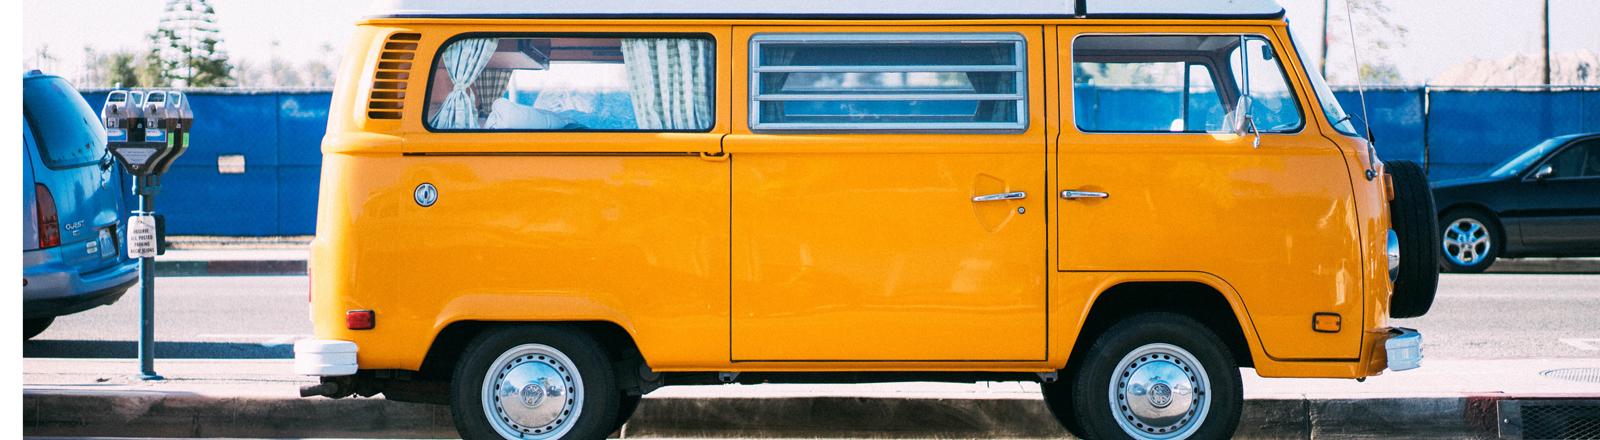 VW-Bus am Straßenrand